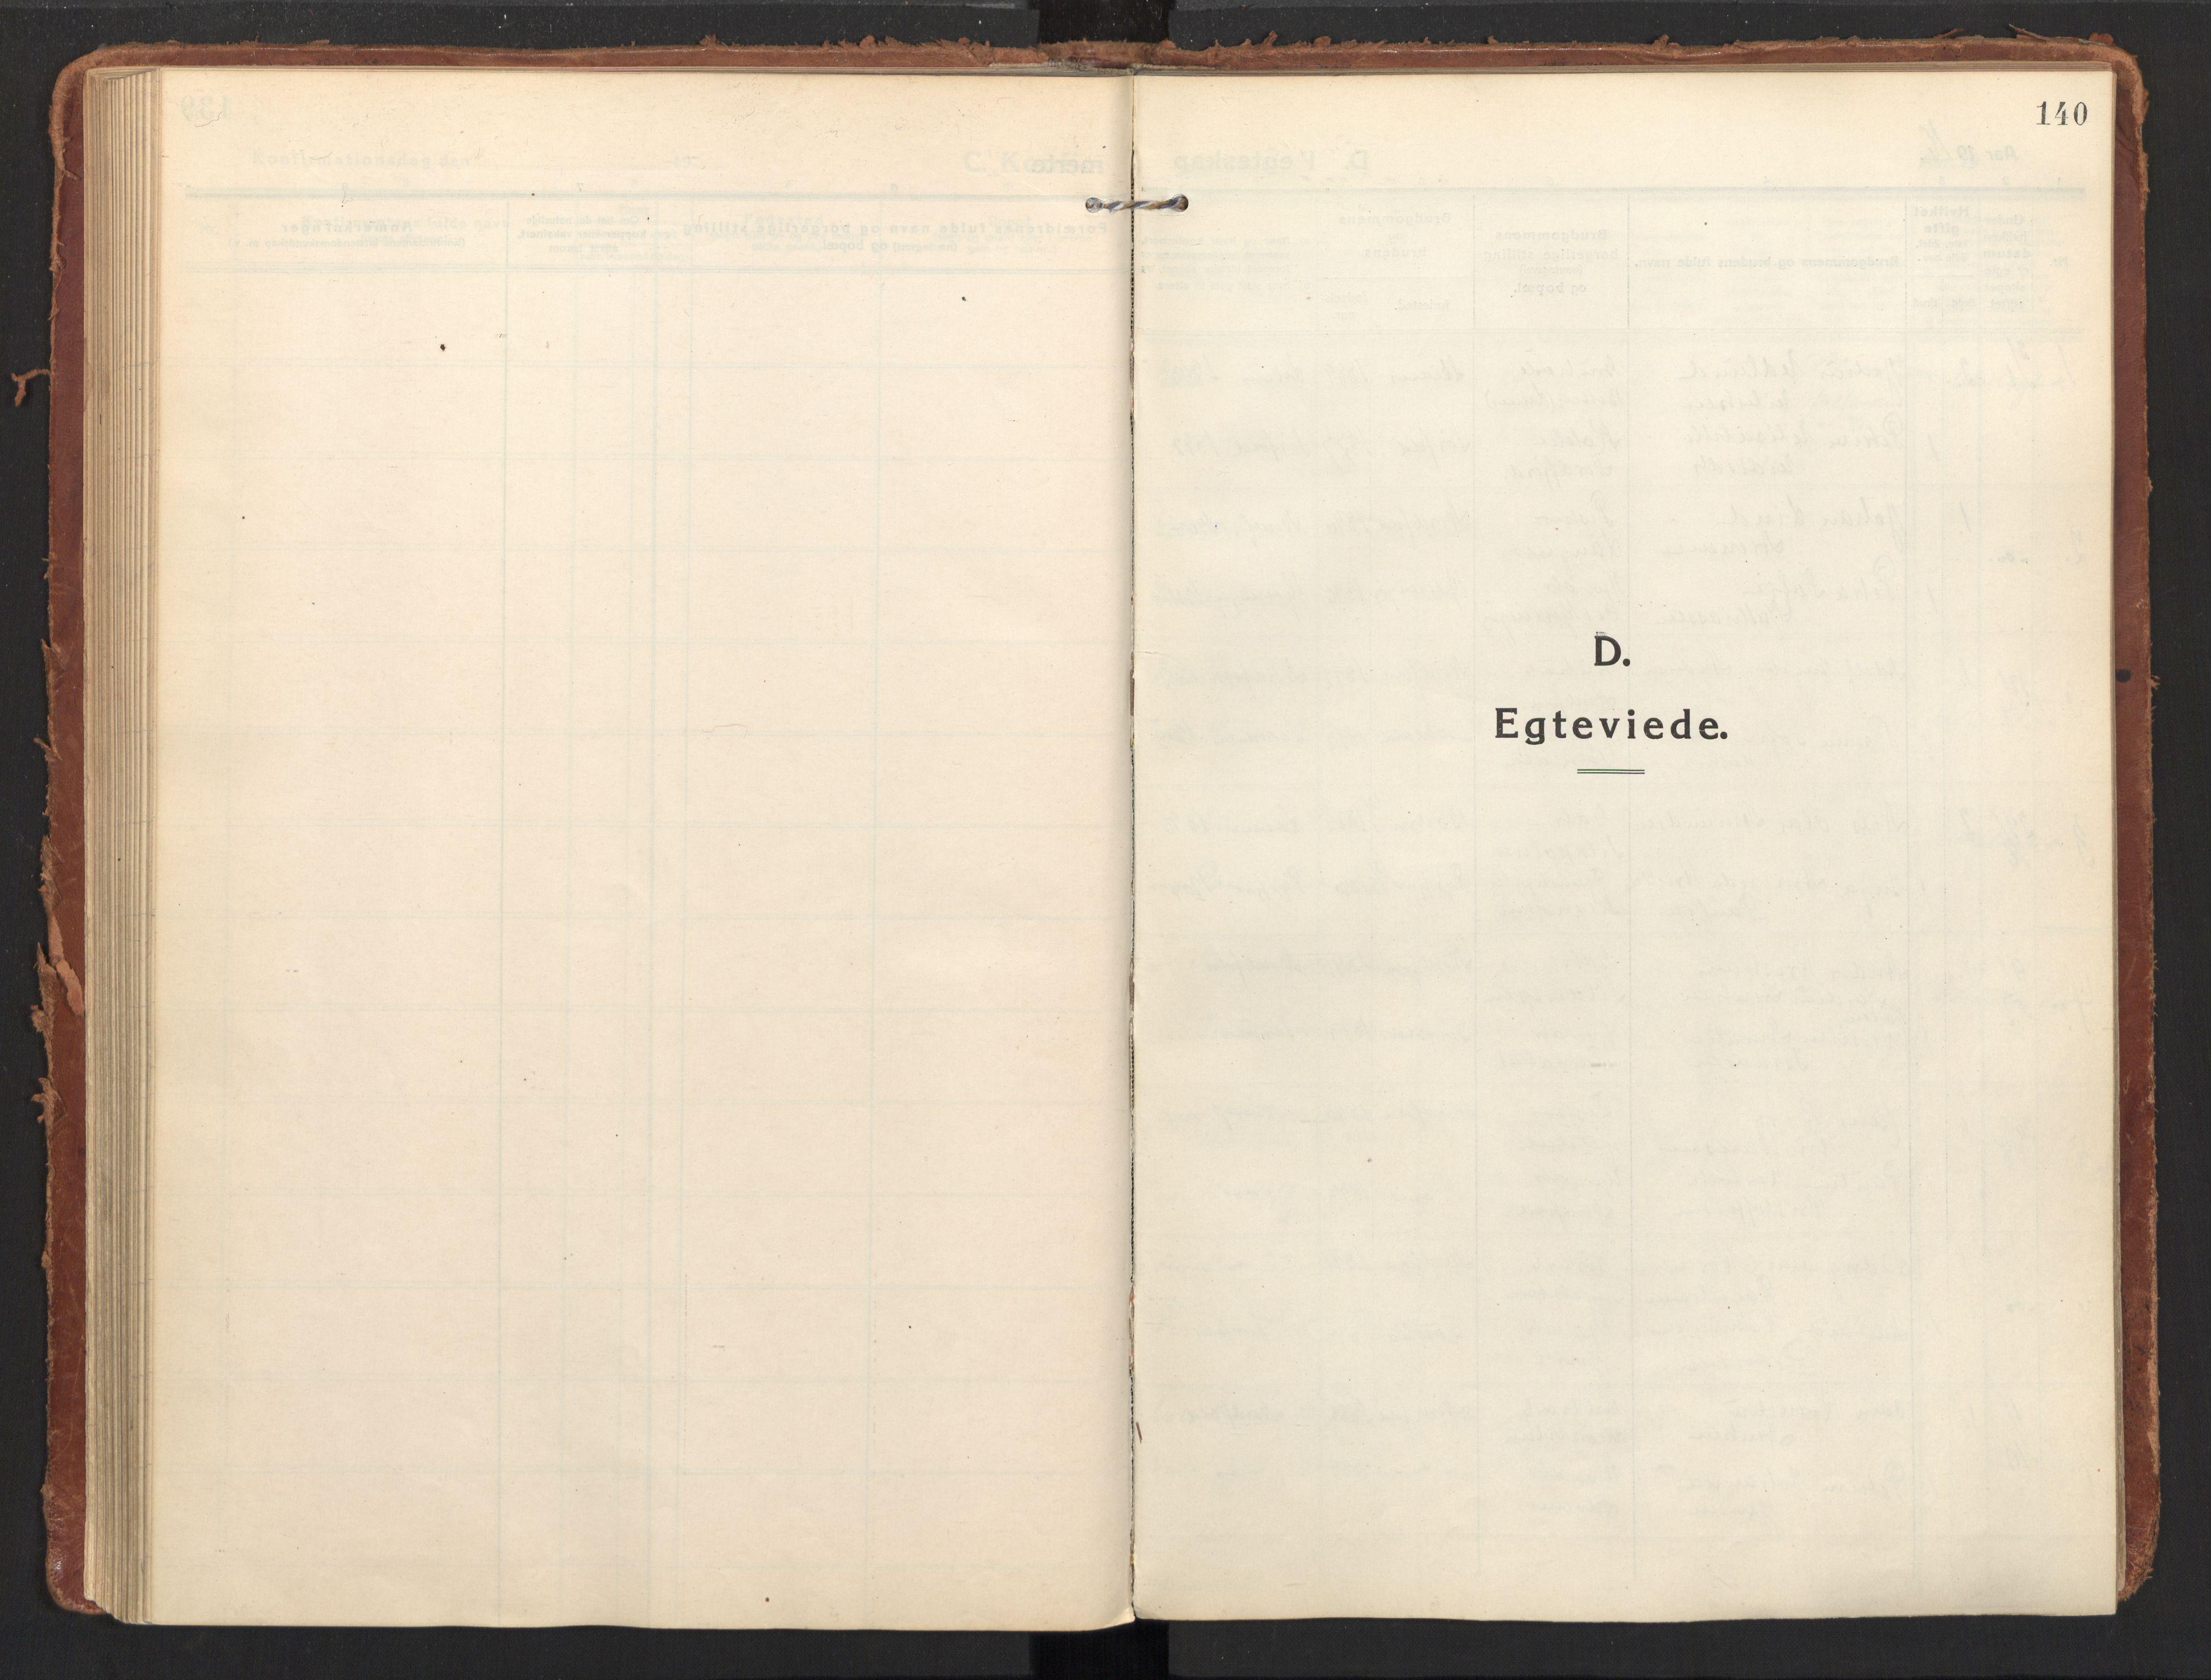 SAT, Ministerialprotokoller, klokkerbøker og fødselsregistre - Nordland, 858/L0833: Ministerialbok nr. 858A03, 1916-1934, s. 140